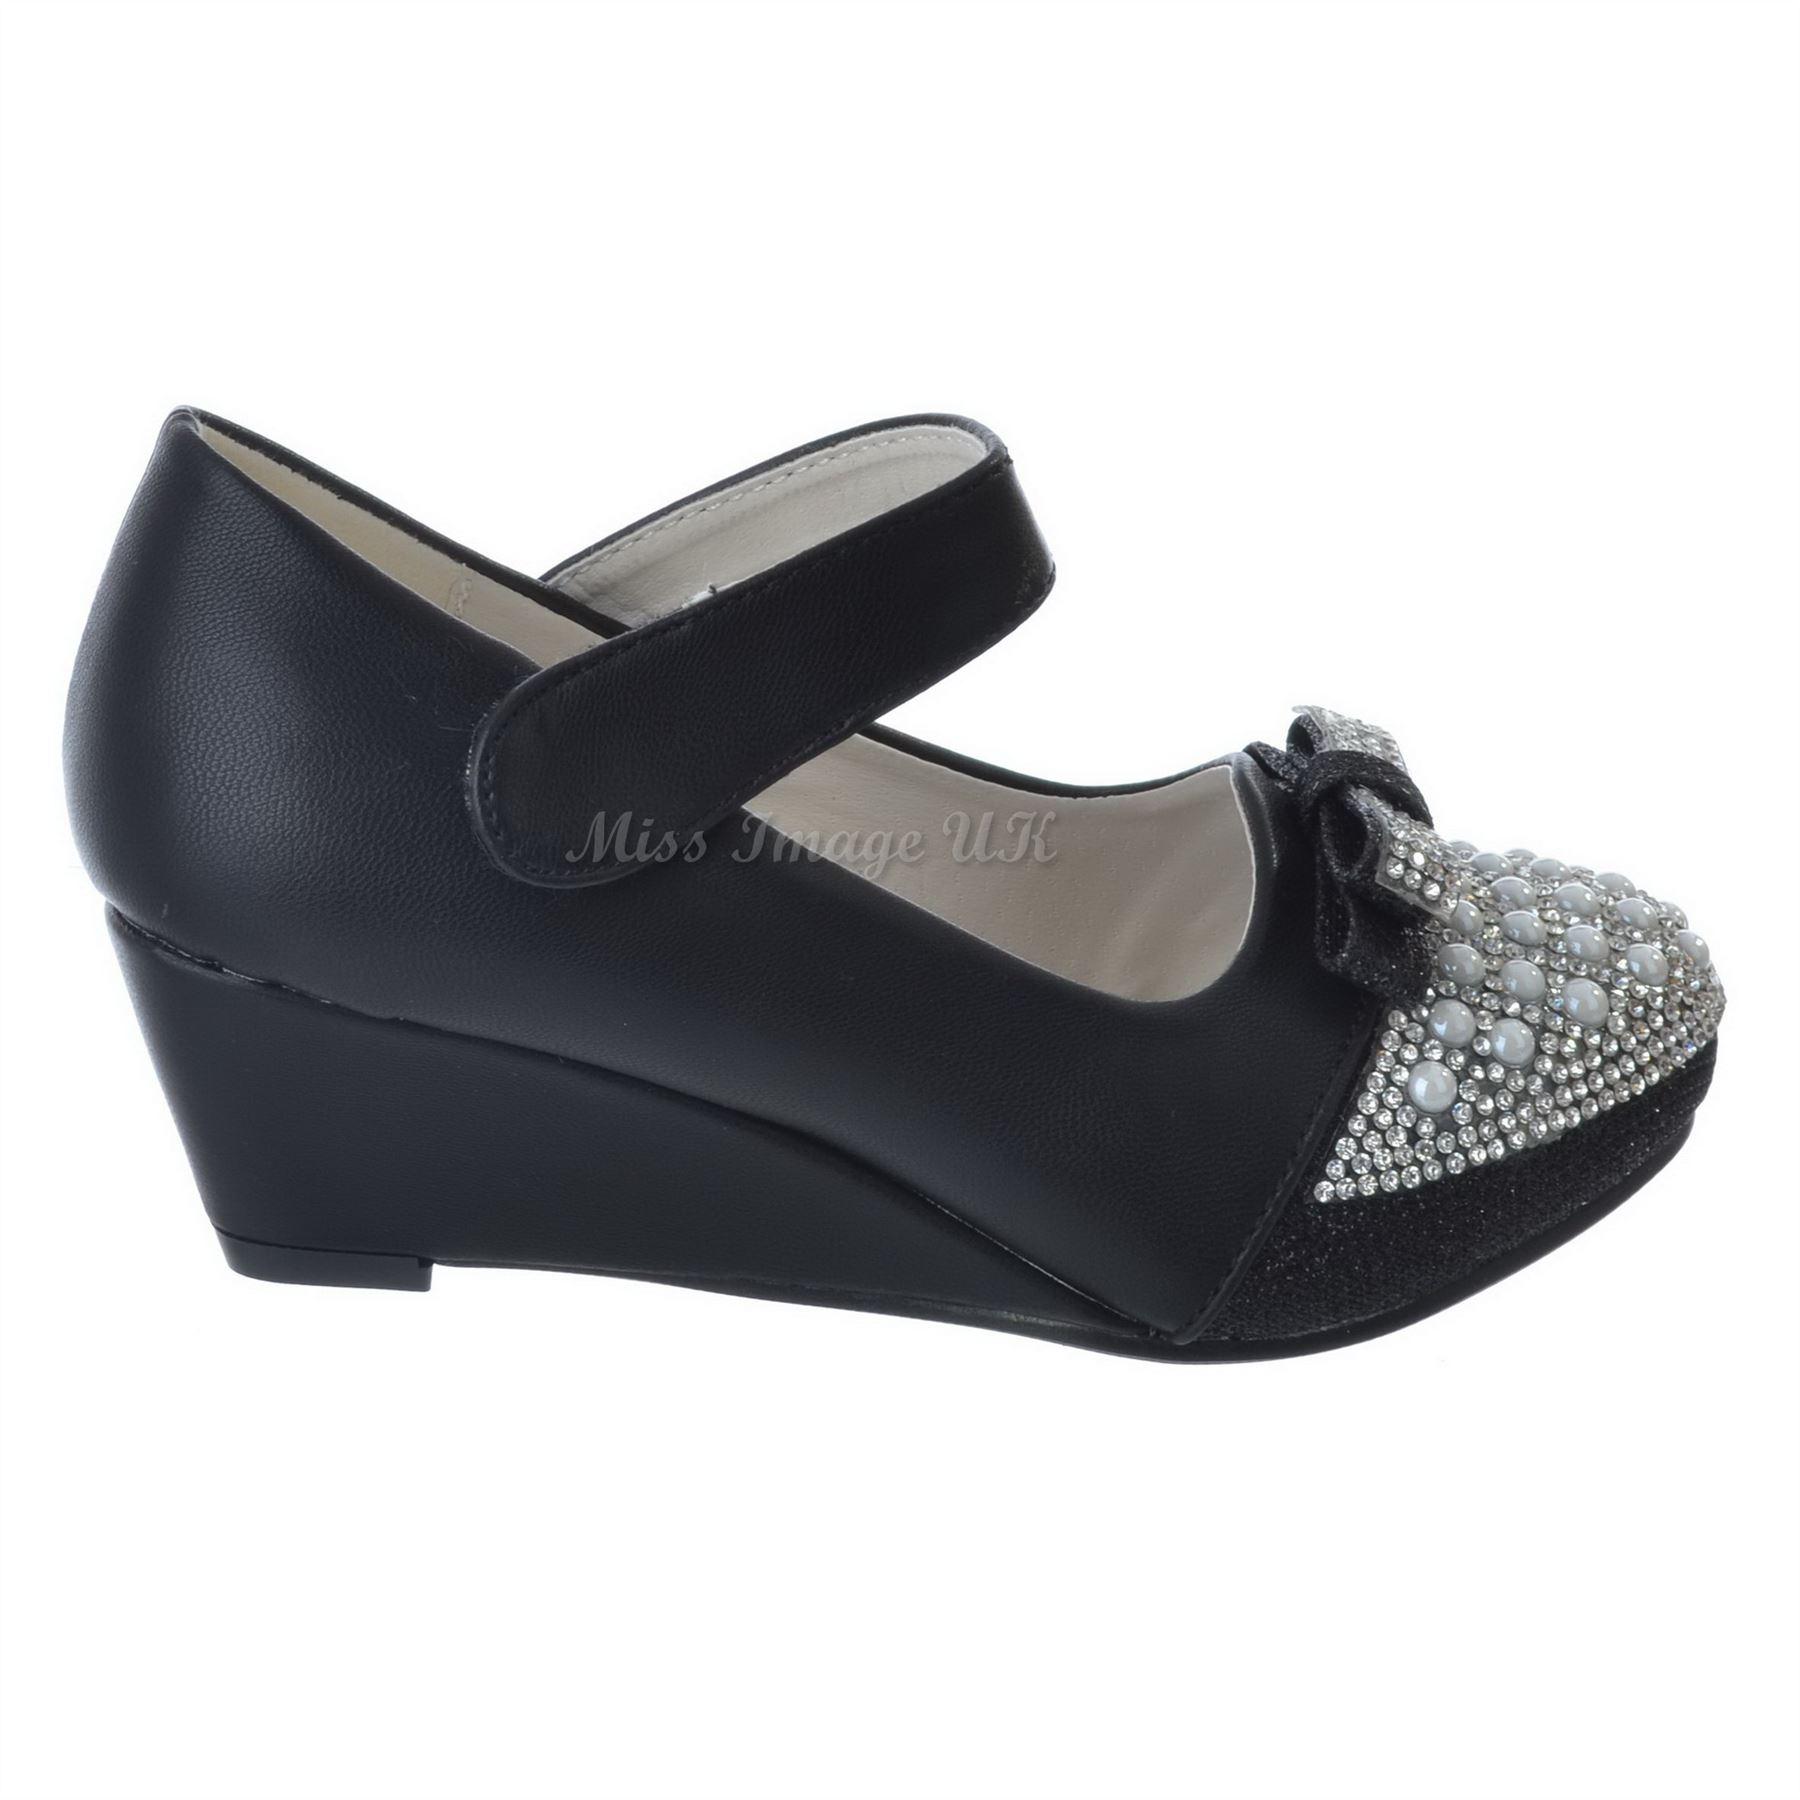 Mary Jane Shoes Wedge Heel